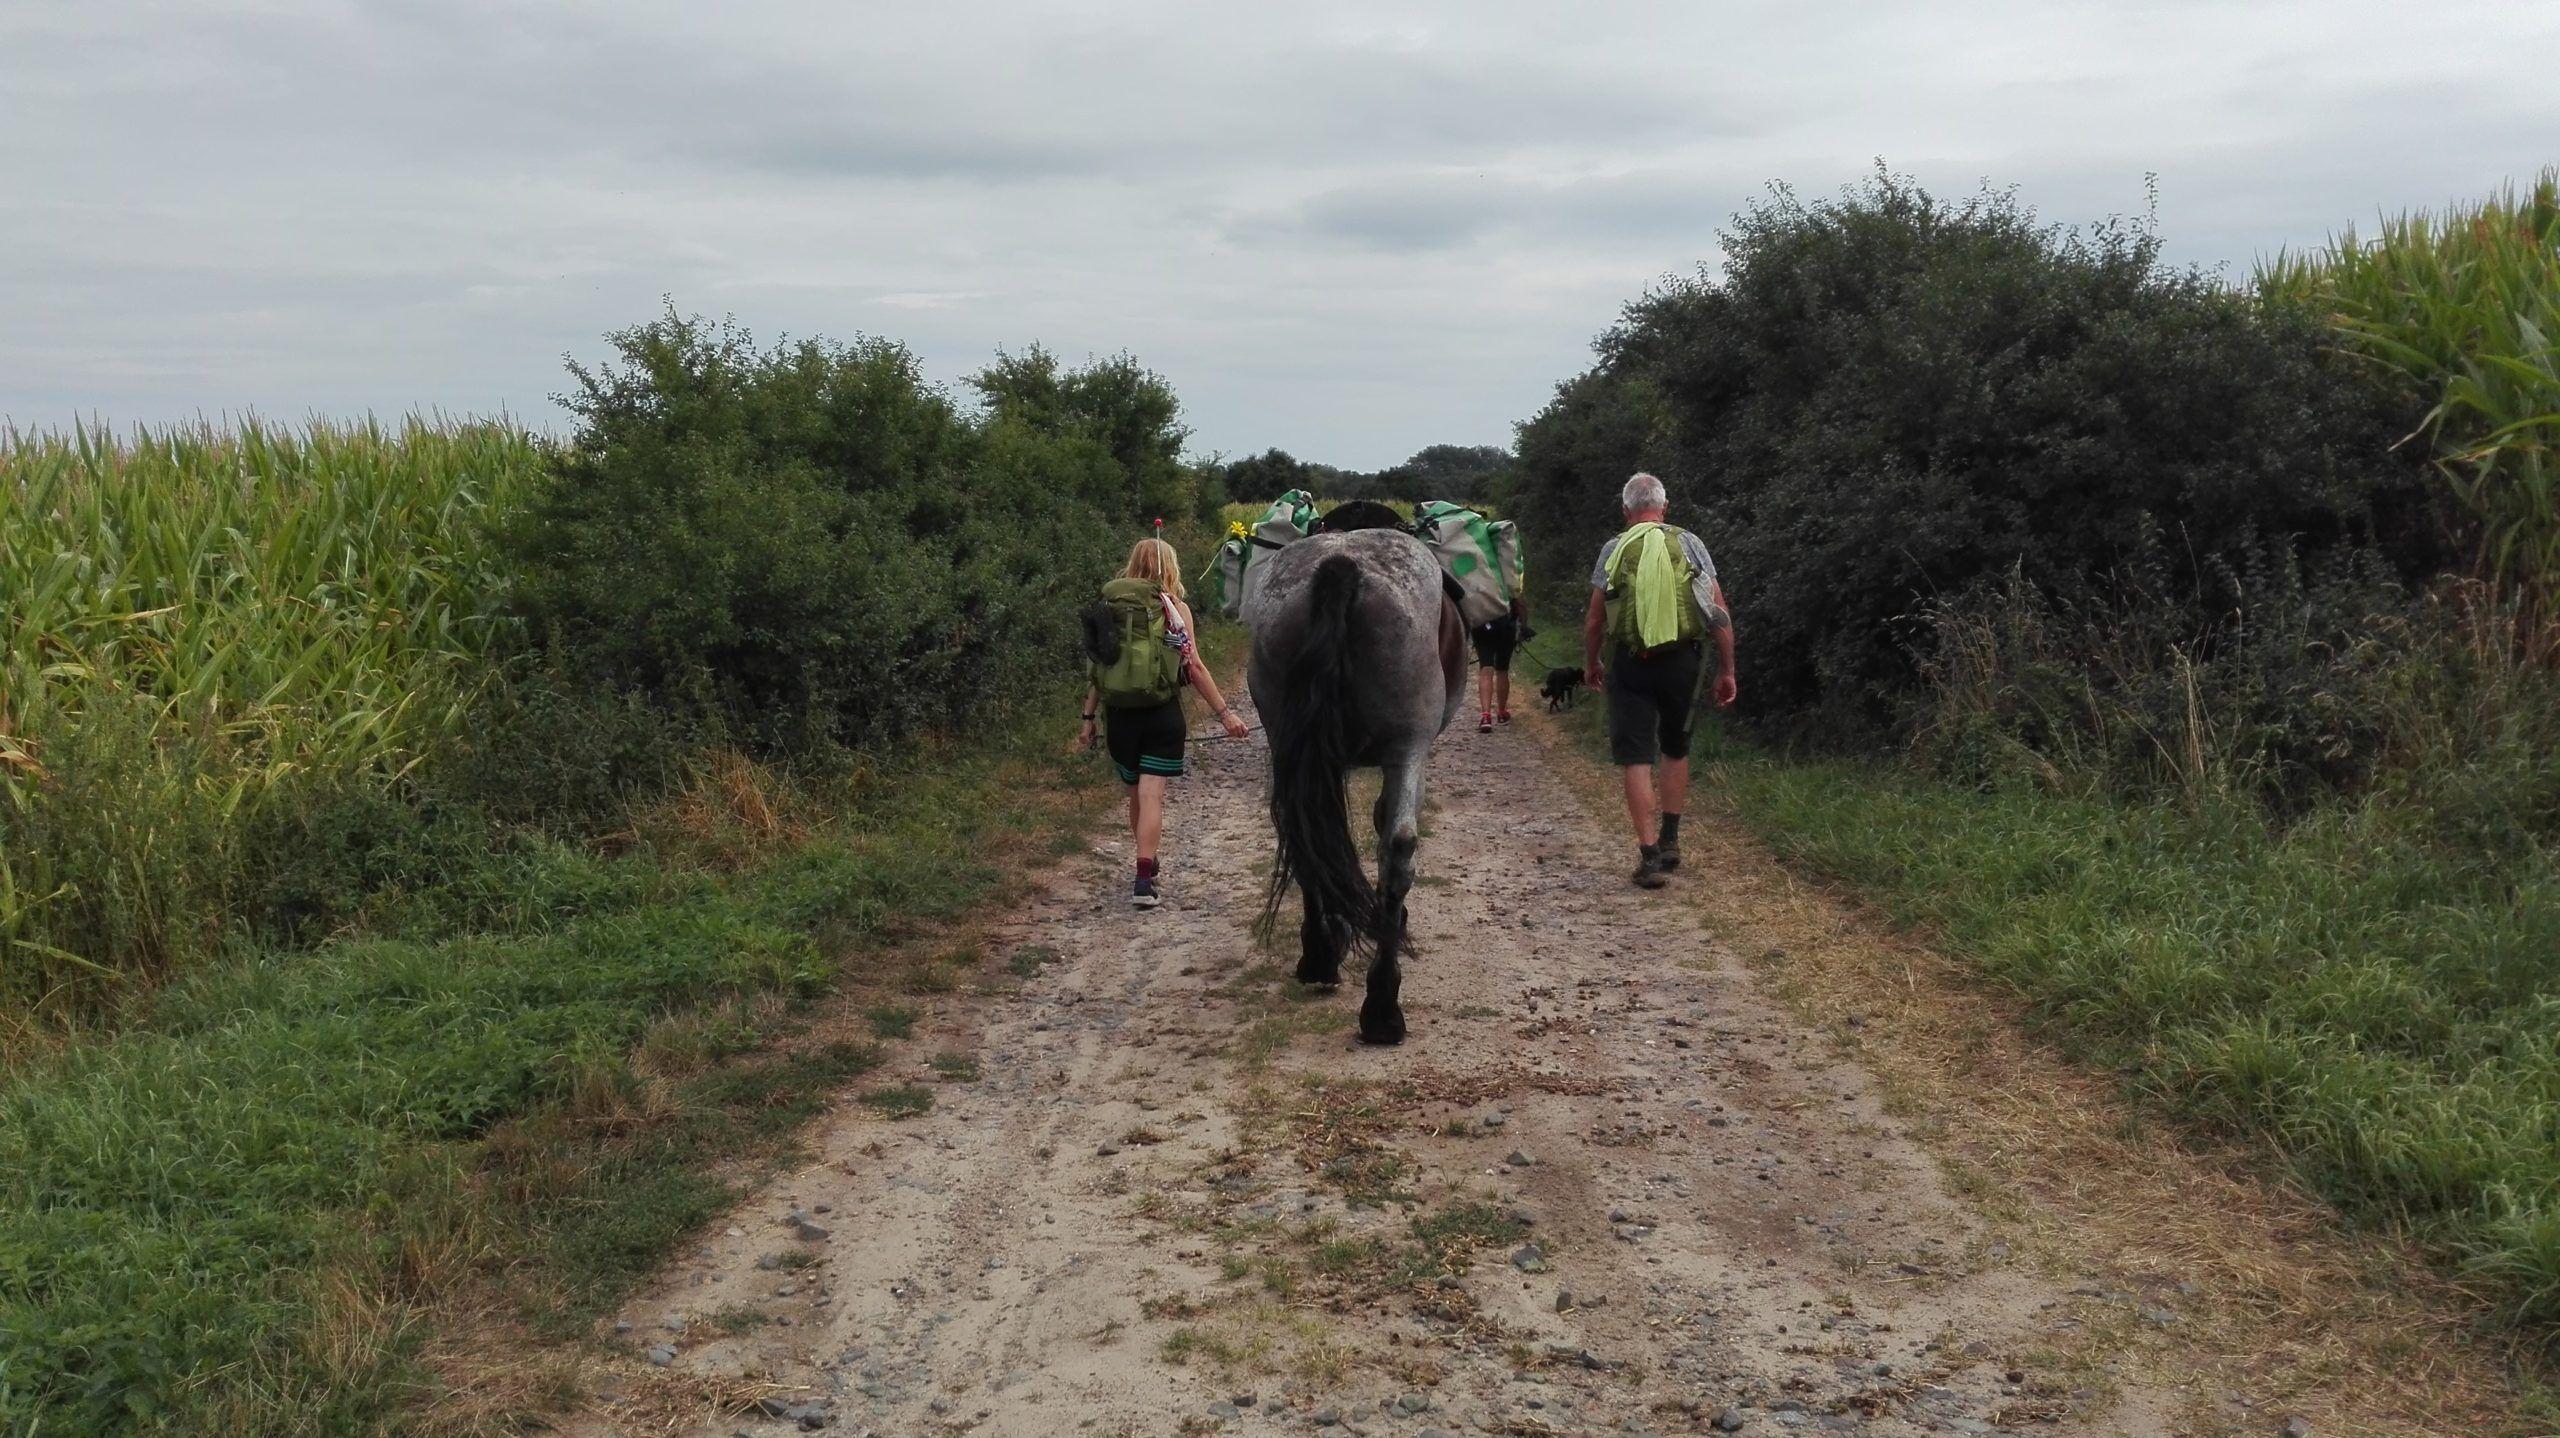 Wanderetappe mit Pferden